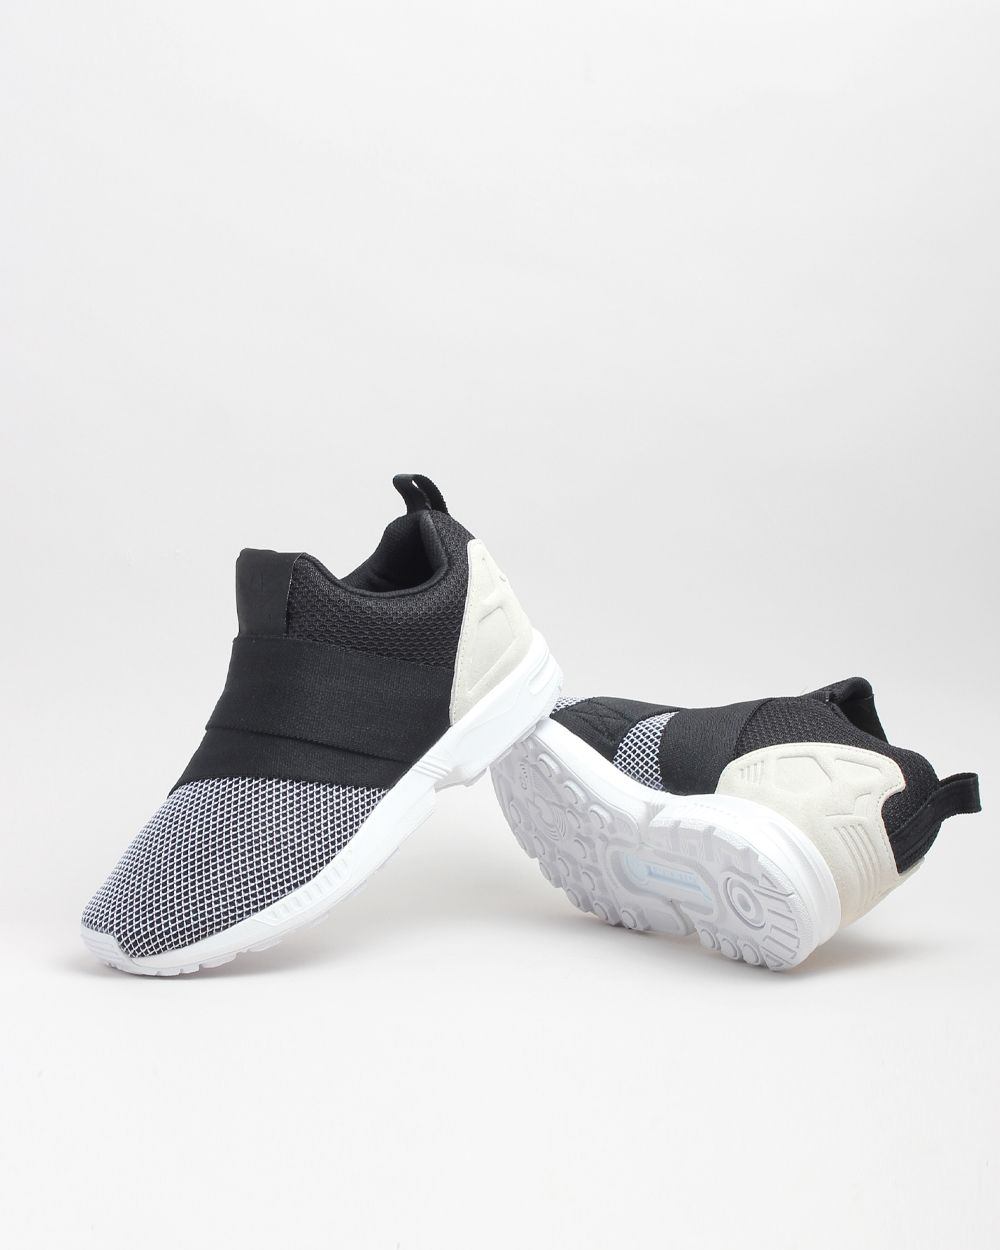 adidas zx flusso mocassini pinterest adidas zx flusso, adidas